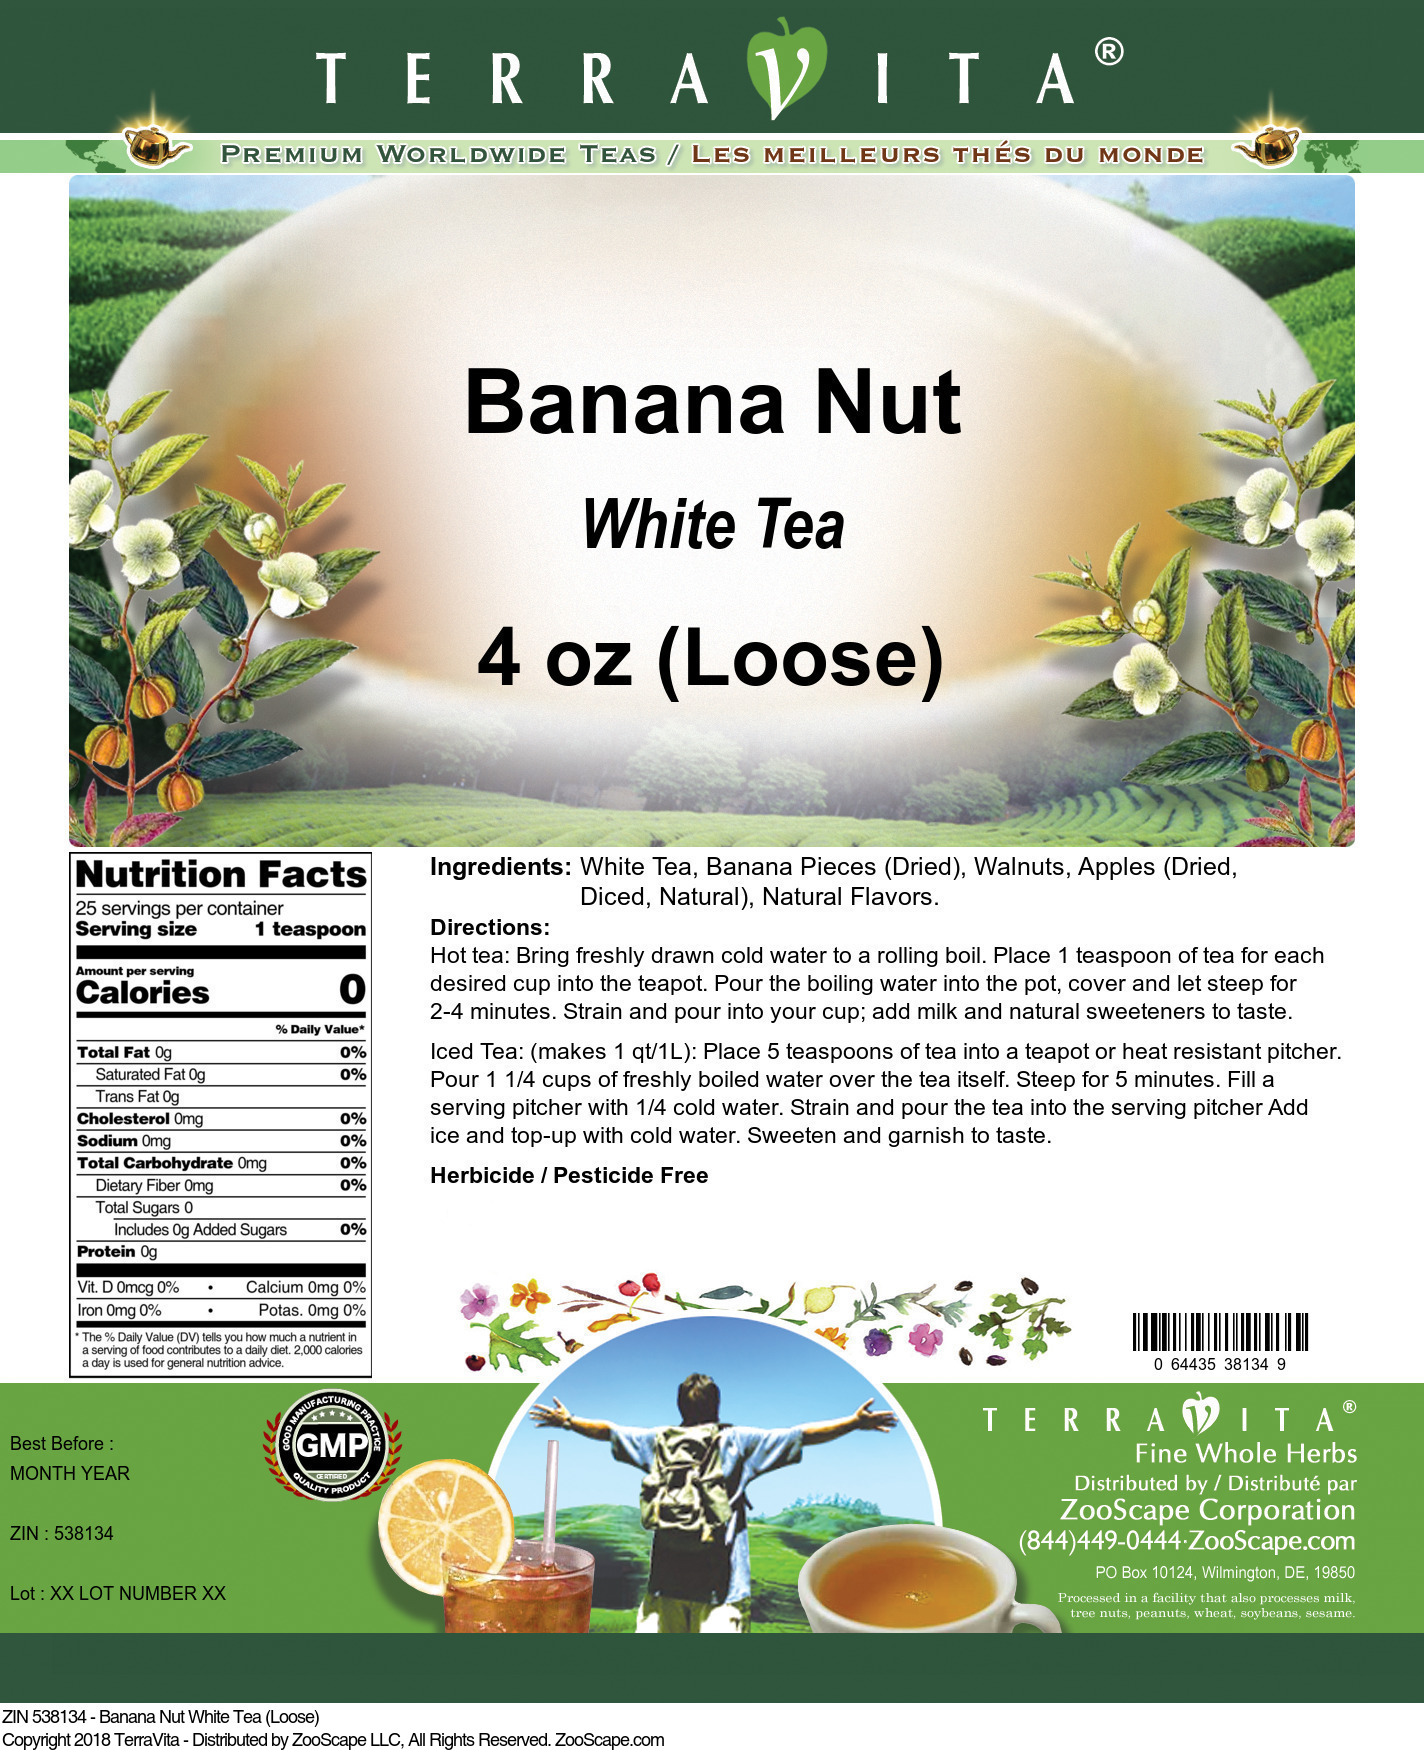 Banana Nut White Tea